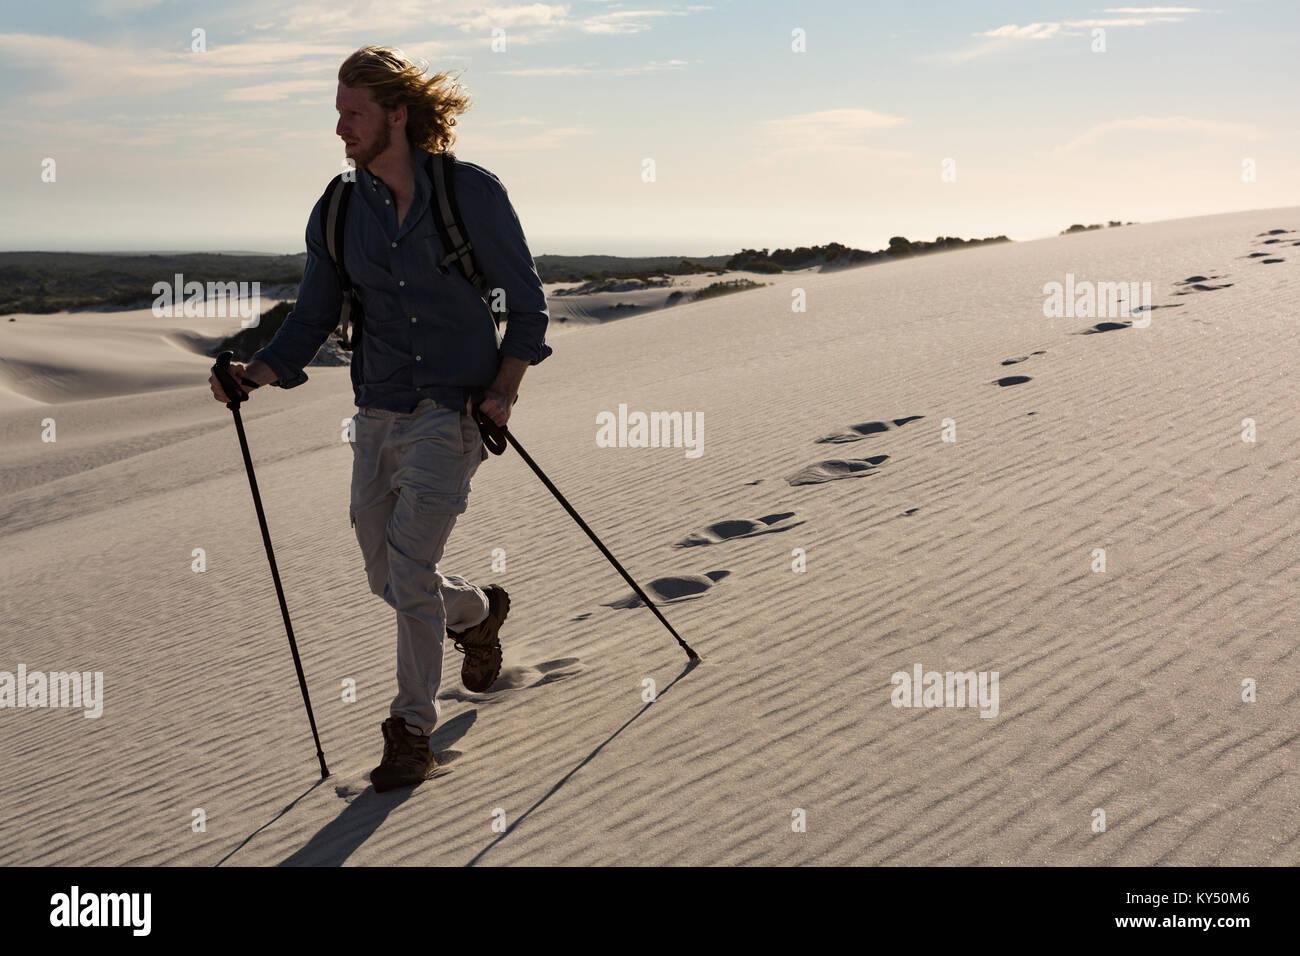 Excursionista con trekking pole caminar sobre arena. Imagen De Stock